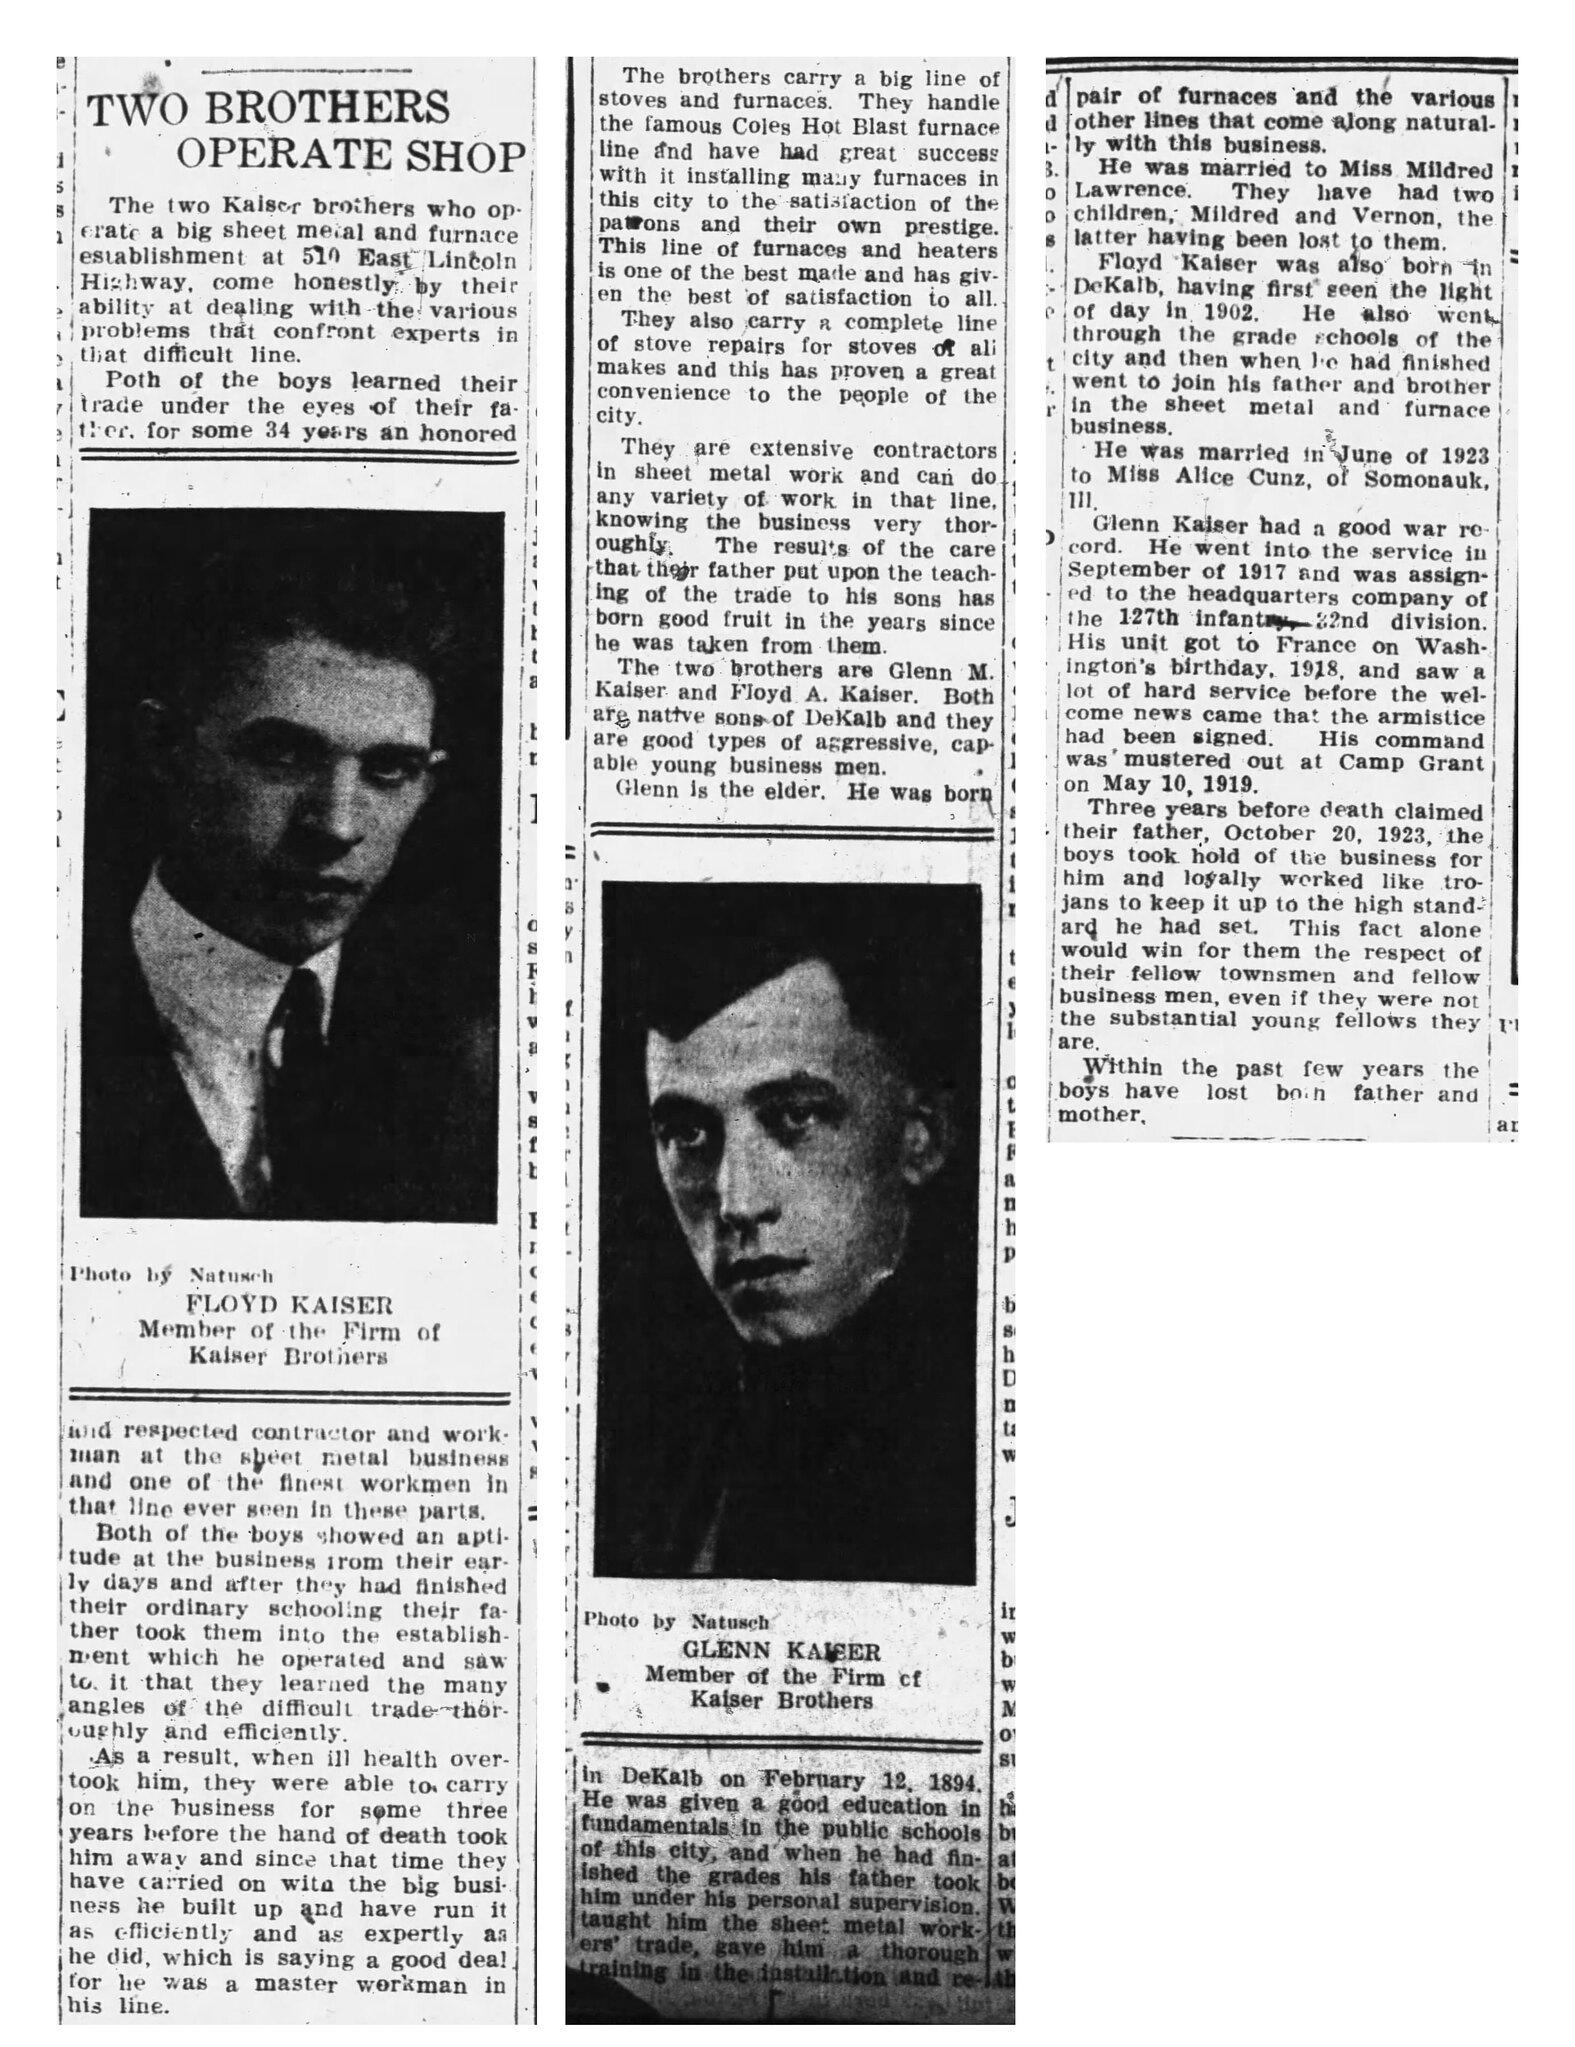 KaiserBros_1924_article